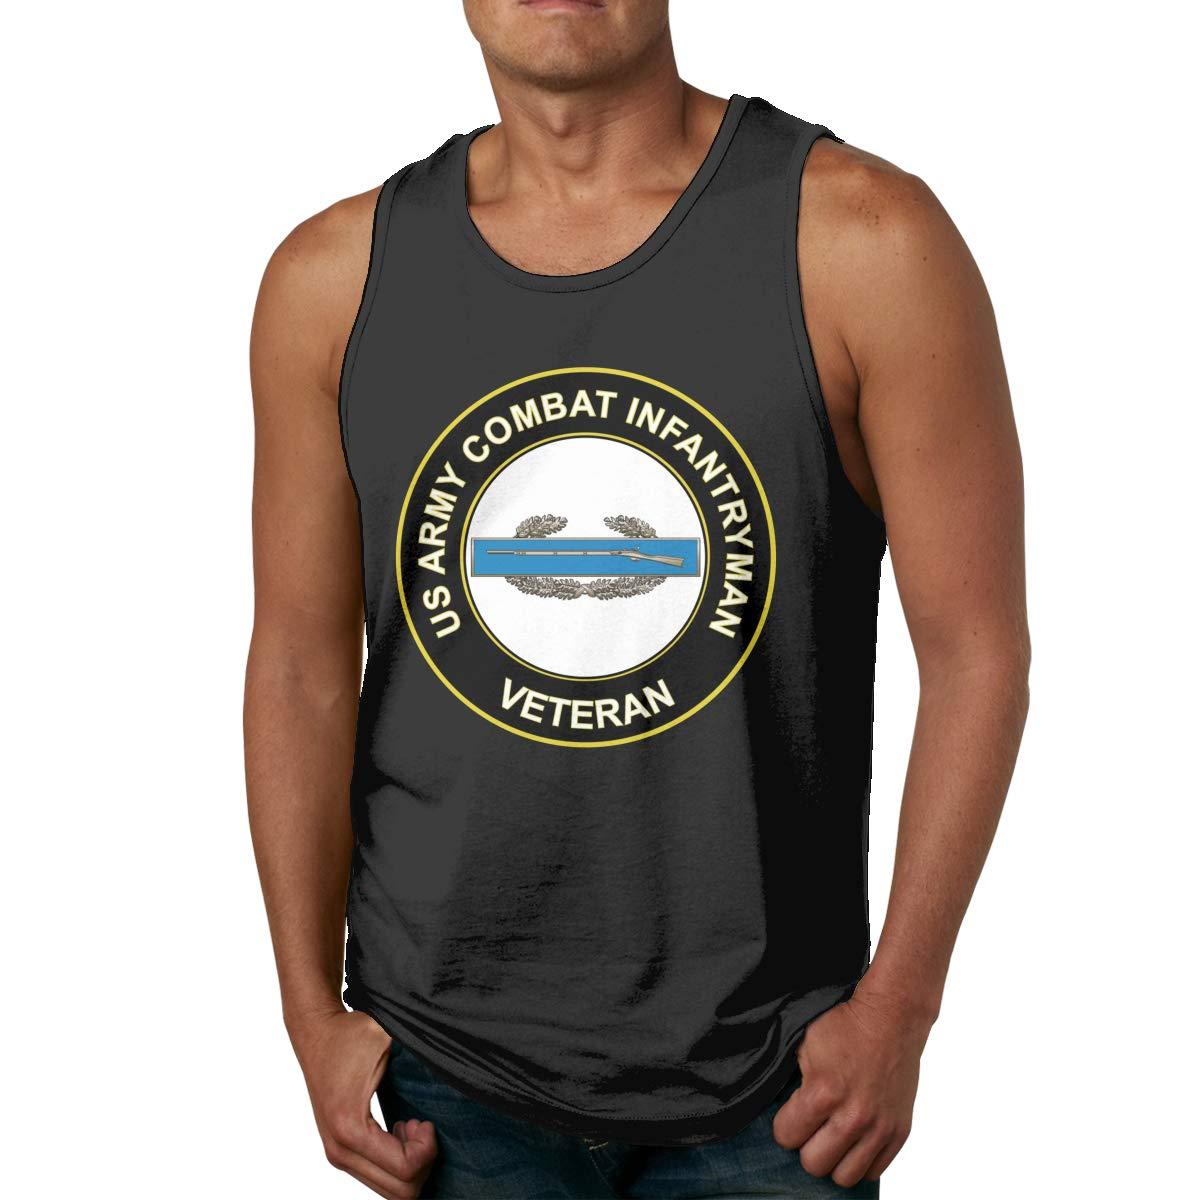 FKAHQ US Army Combat Infantryman CIB 1st Award Veteran Male Printed Vest Sports Tank-Top Tee Leisure Sleeveless Tee